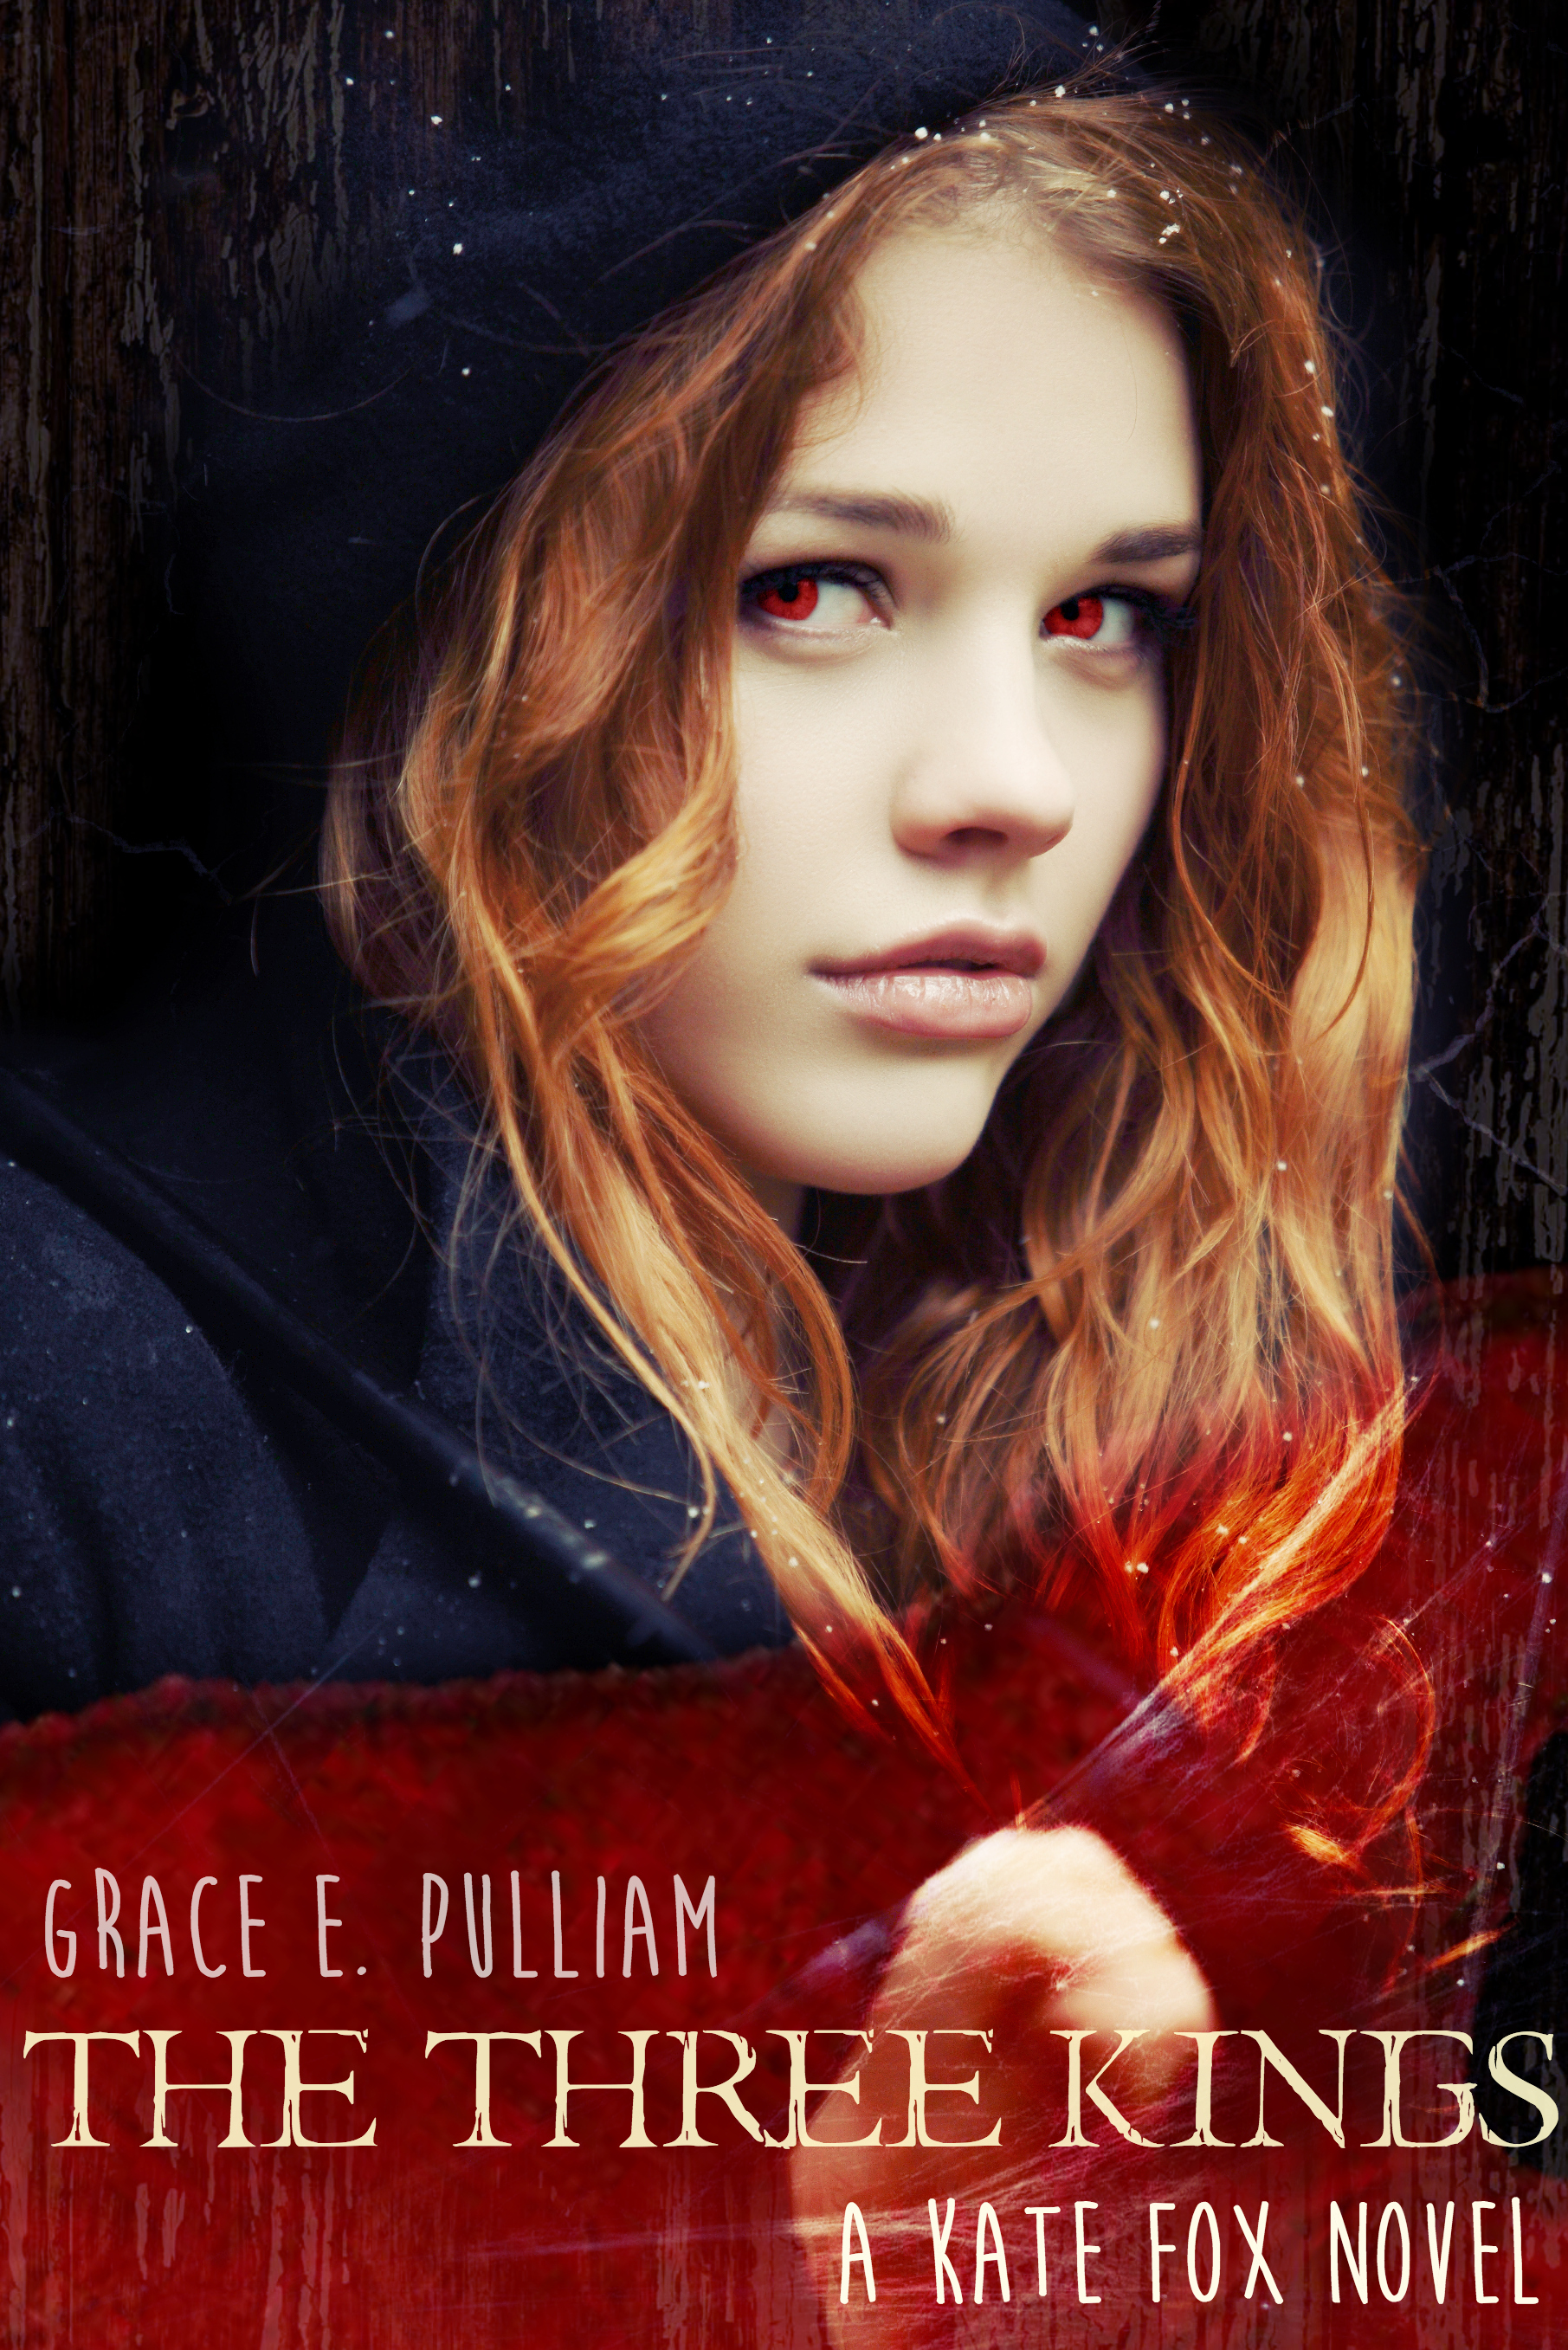 The Three Kings (Kate Fox #1) Grace E. Pulliam